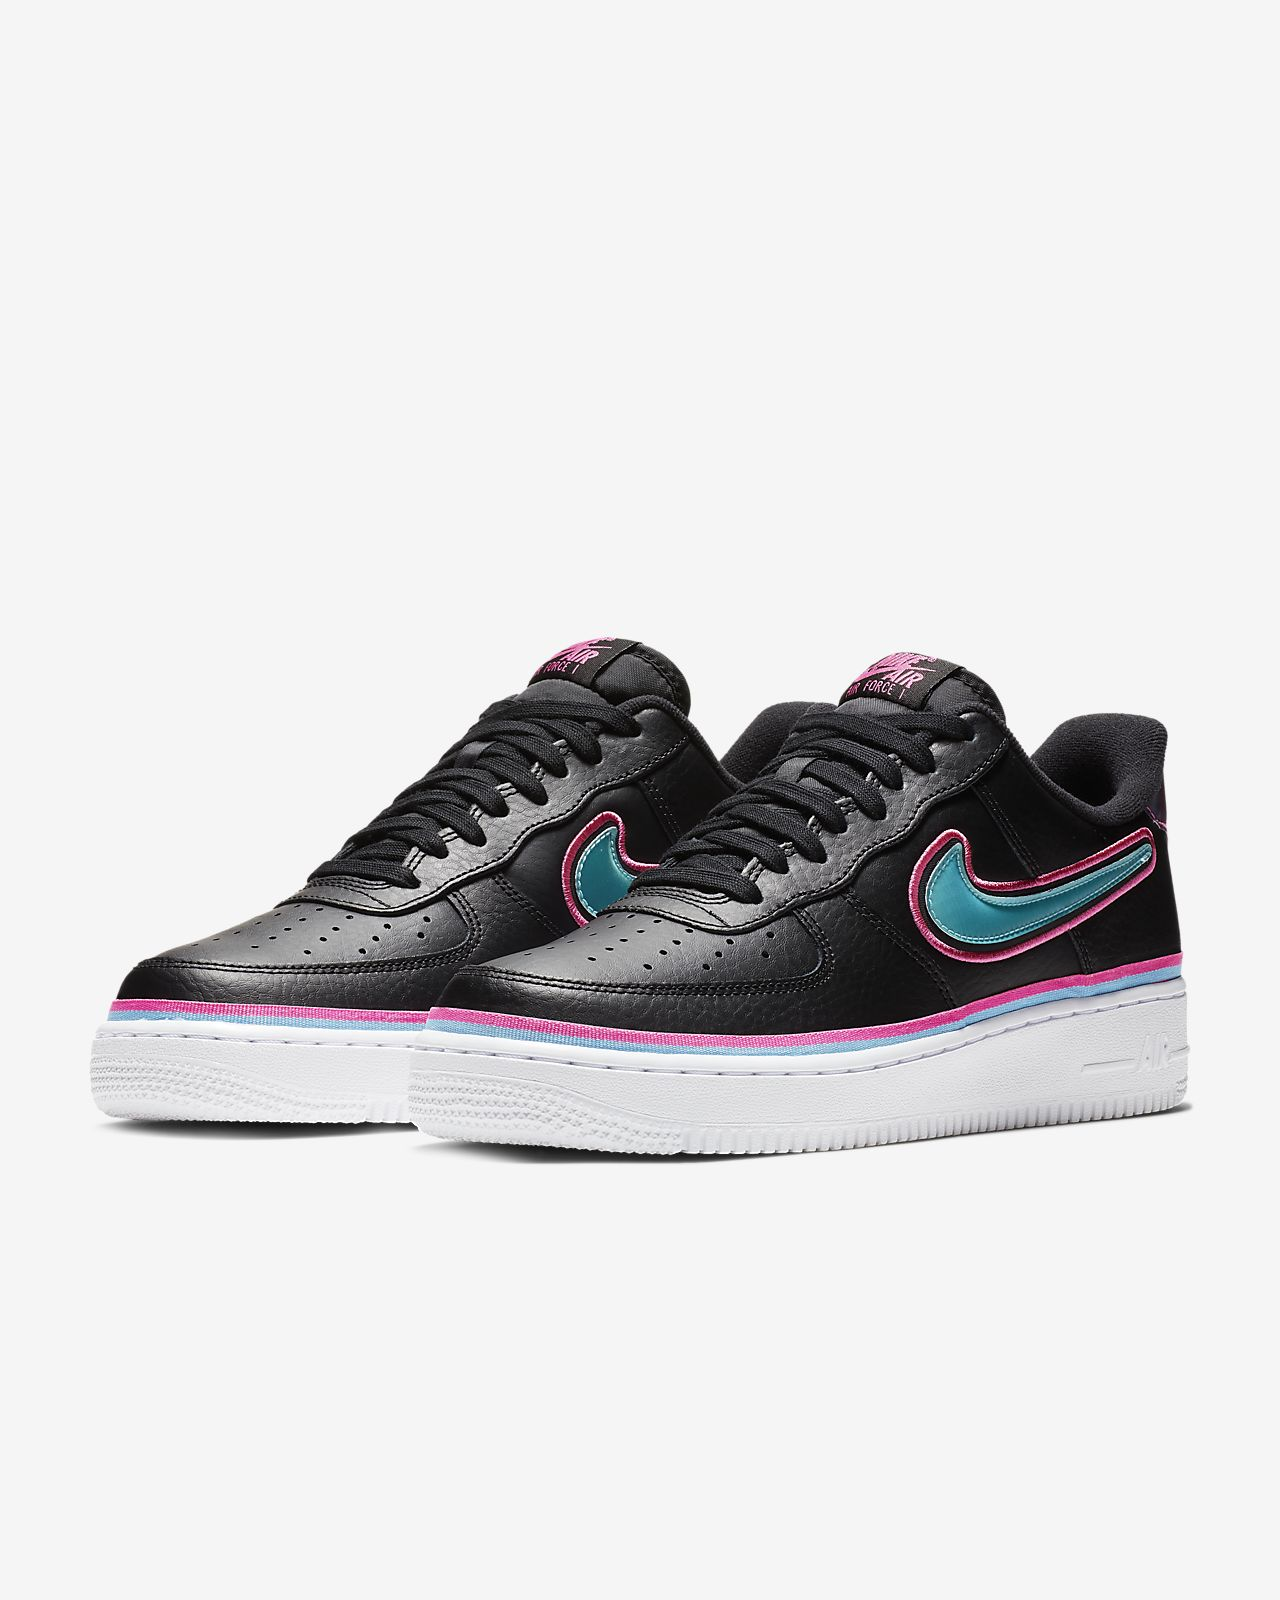 97f96e6f543 Nike Air Force 1  07 LV8 Sport NBA Shoe. Nike.com GB